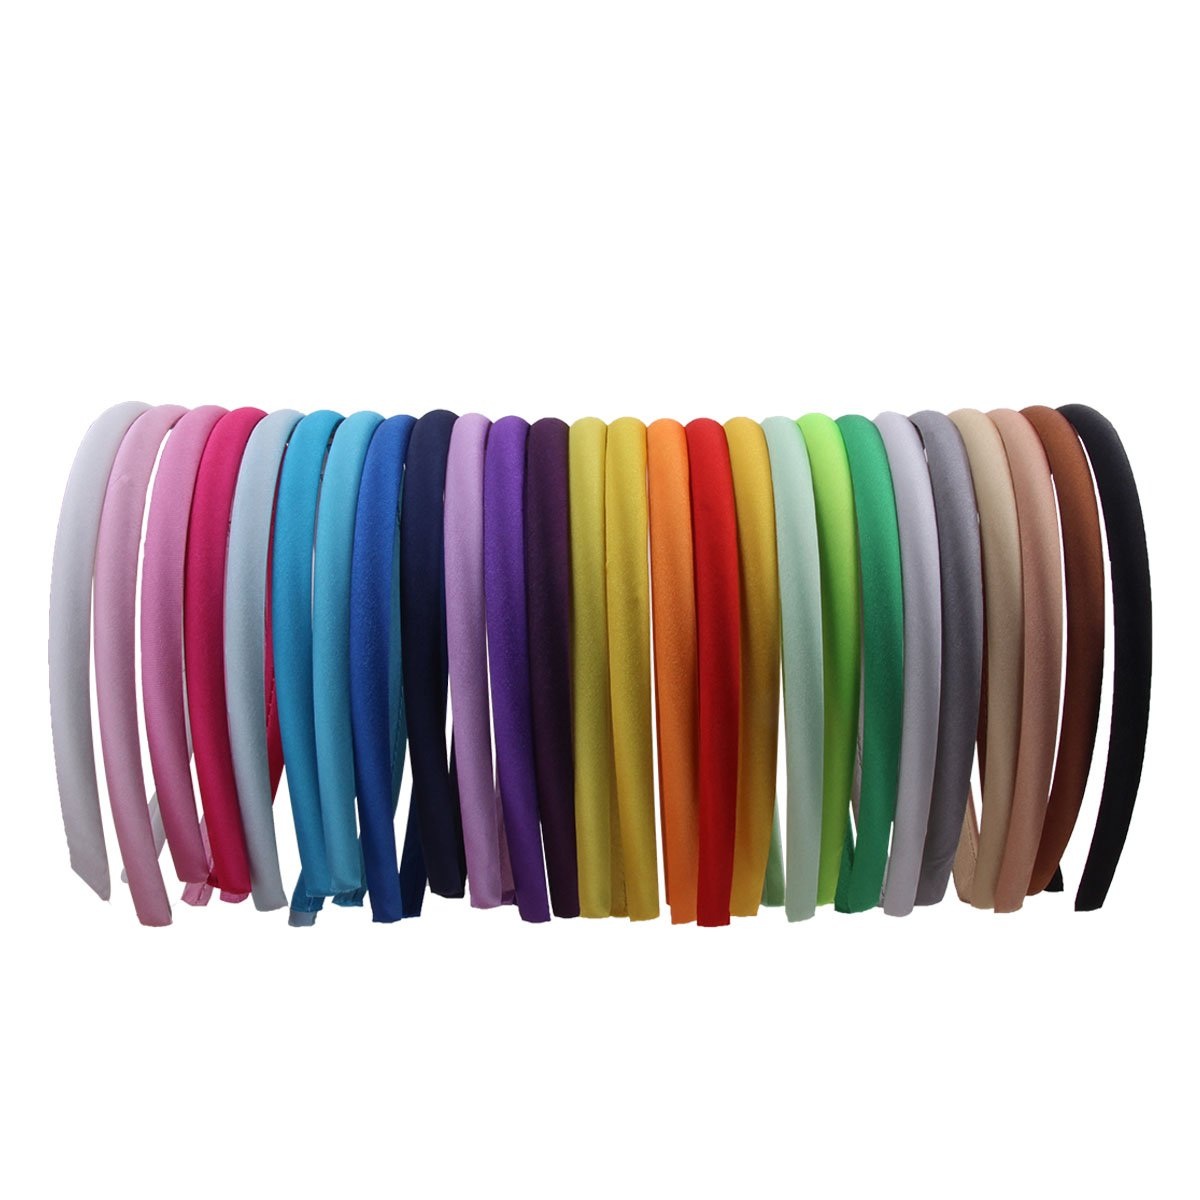 Candygirl Girls' DIY Satin Covered Headbands 1cm Width 36cm Circle Size(26pcs Per Pack Each Color 1pcs)